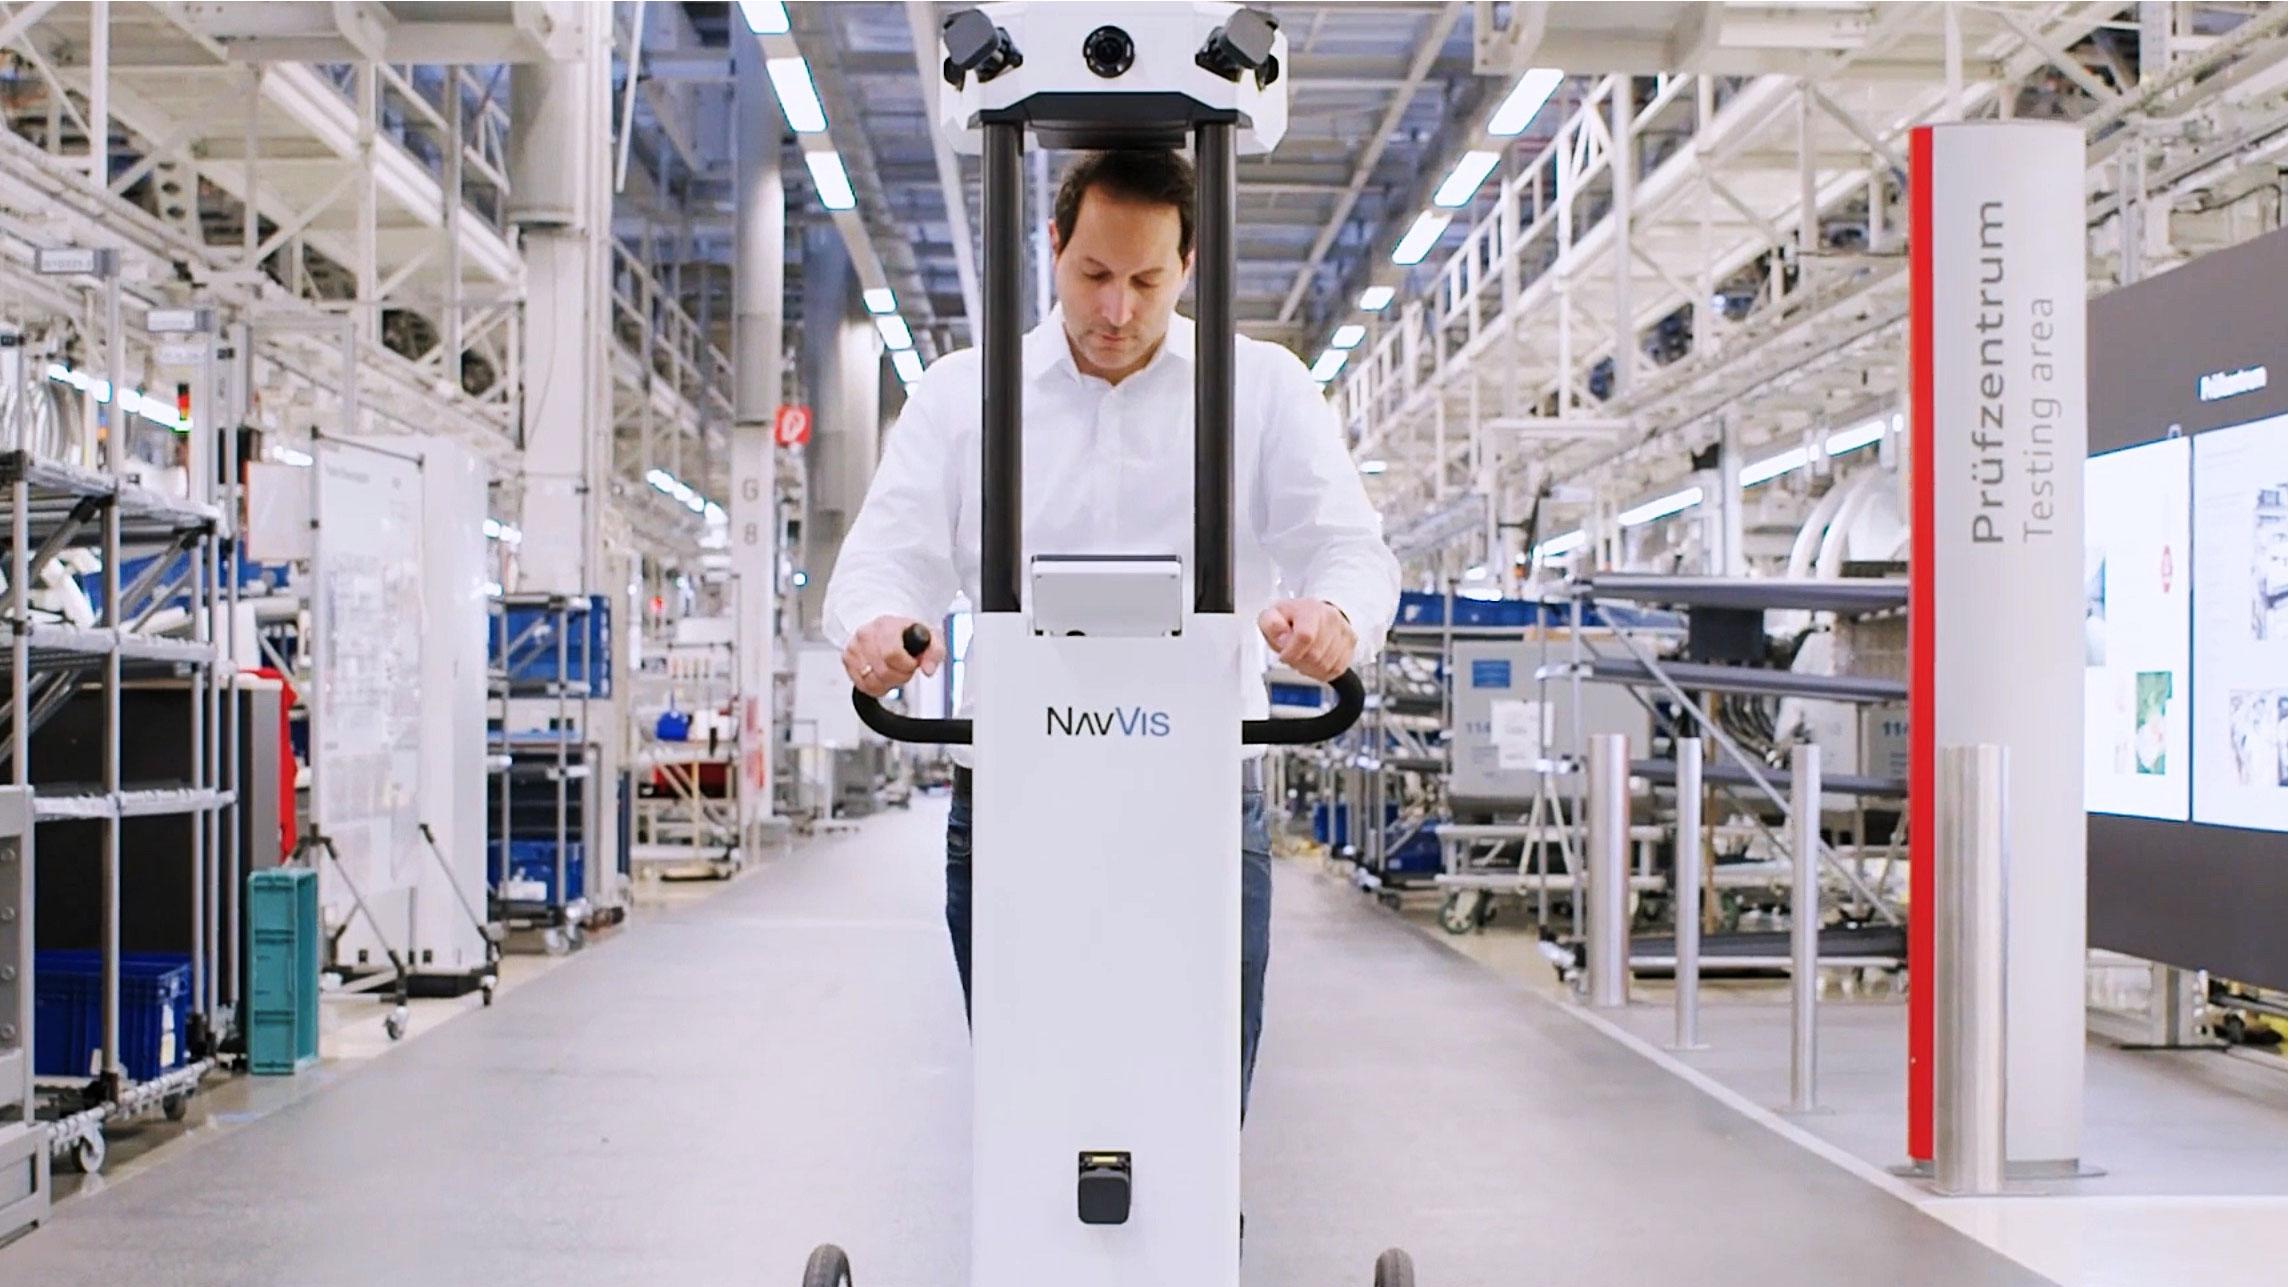 Reality Capture hilft bei der Fabrikplanung in der Autoindustrie